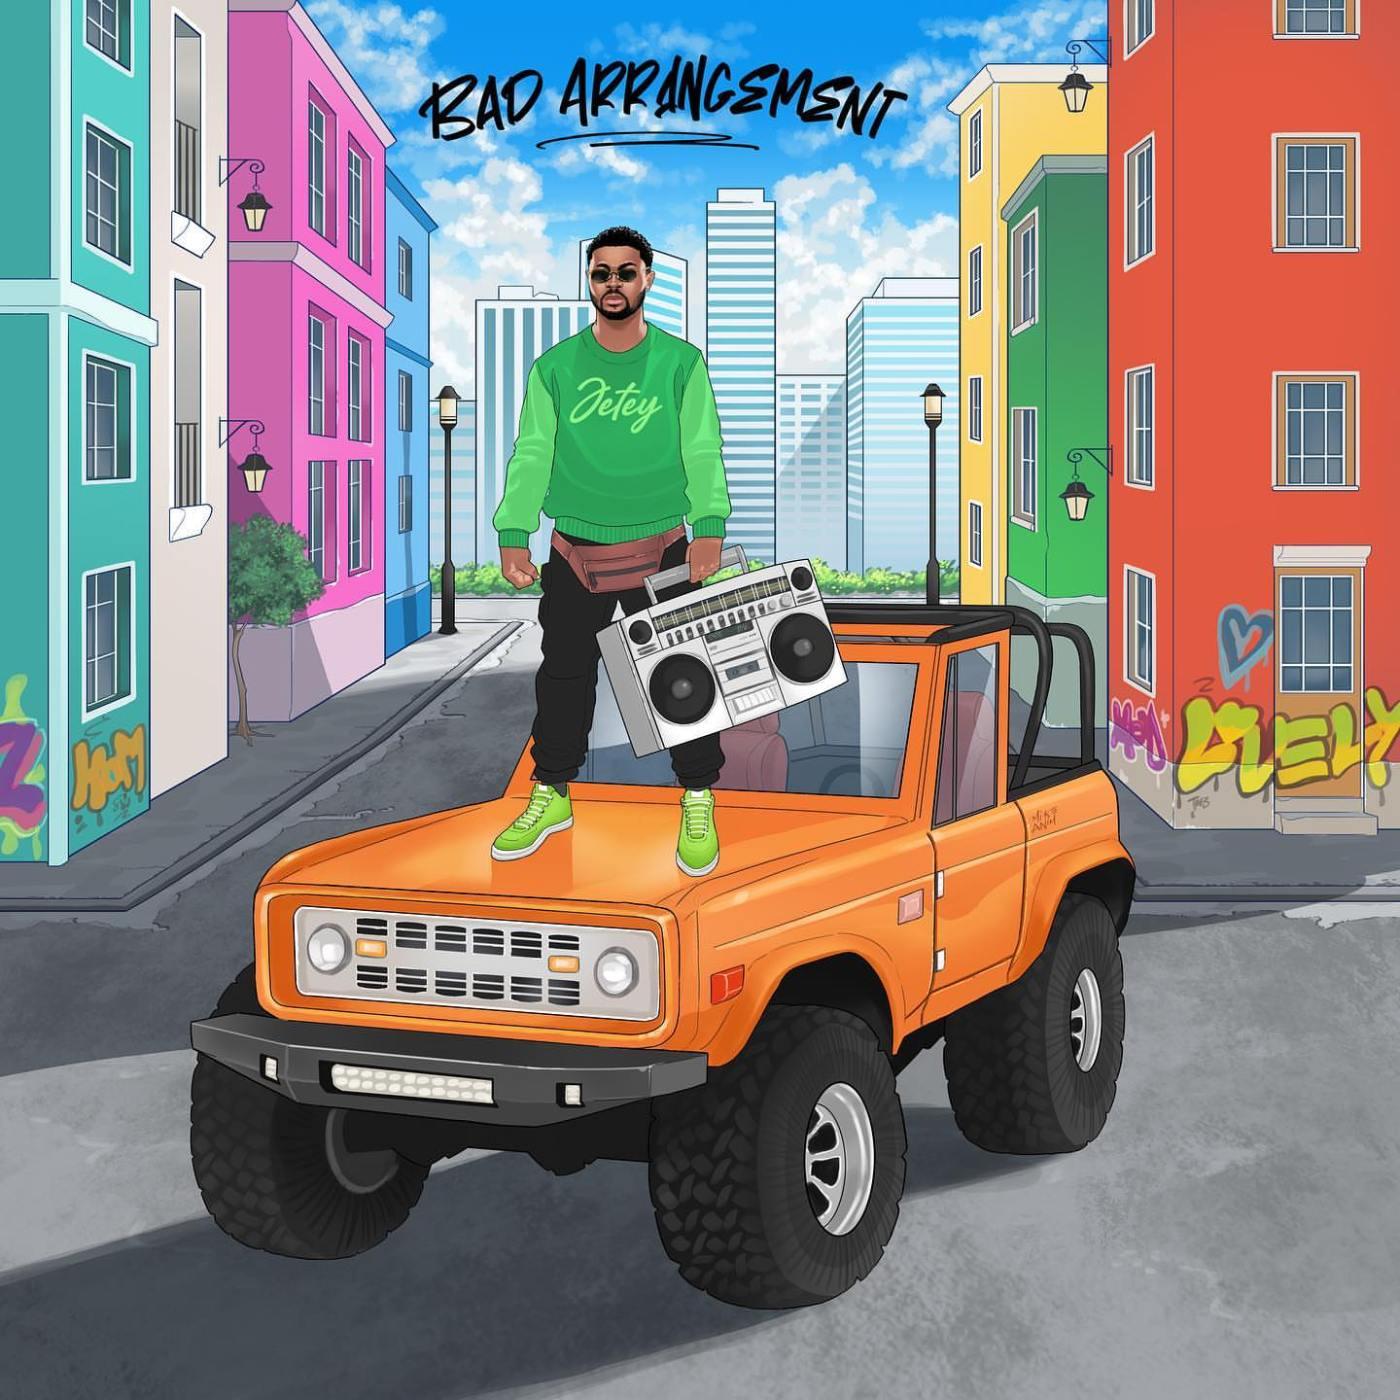 Jetey - Bad Arrangement EP